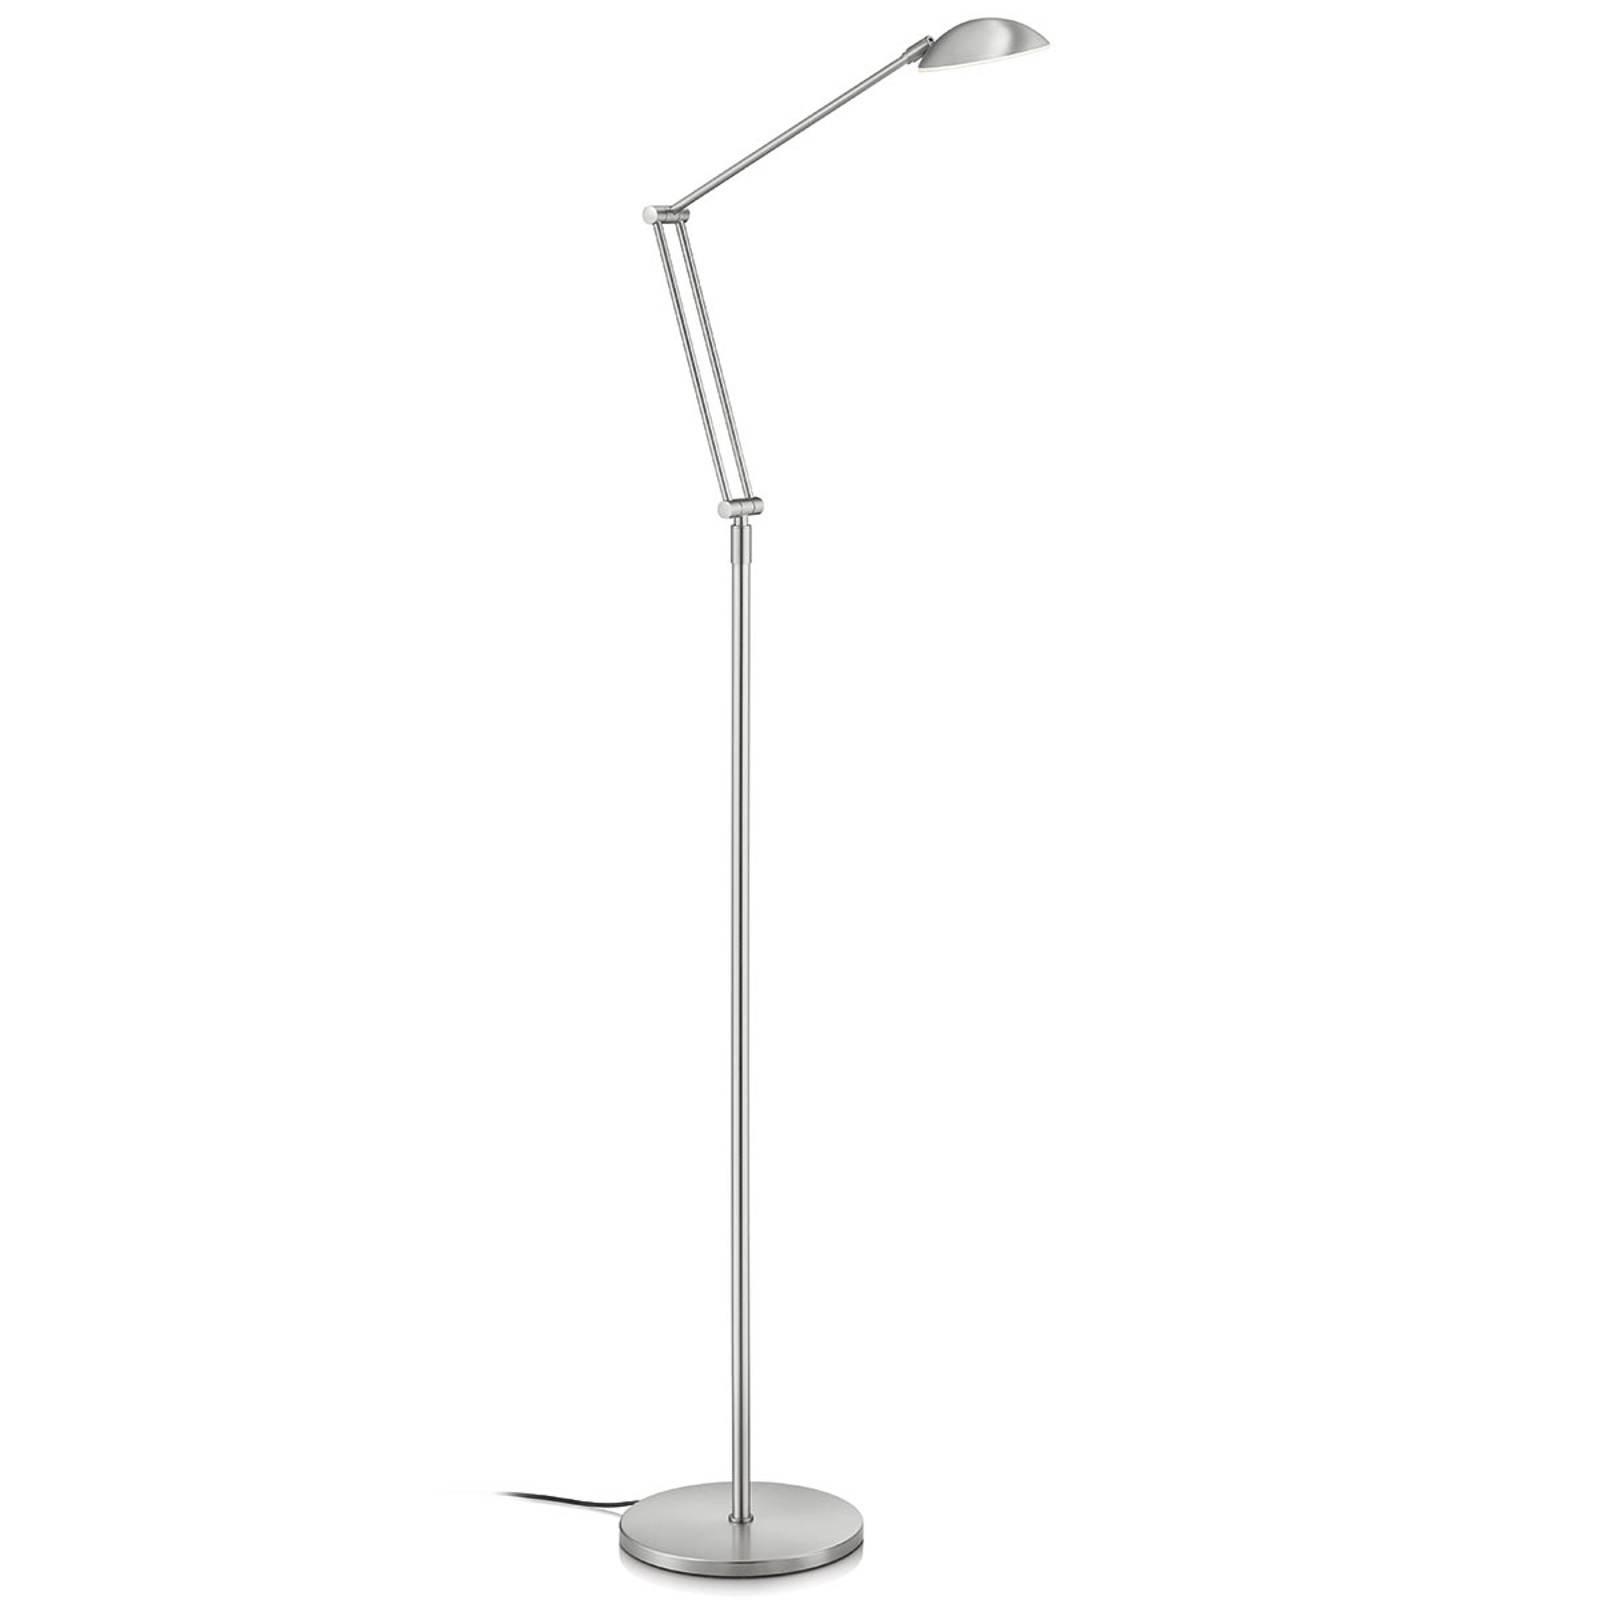 Justerbar LED-gulvlampe Artemis, bevegelsesstyring